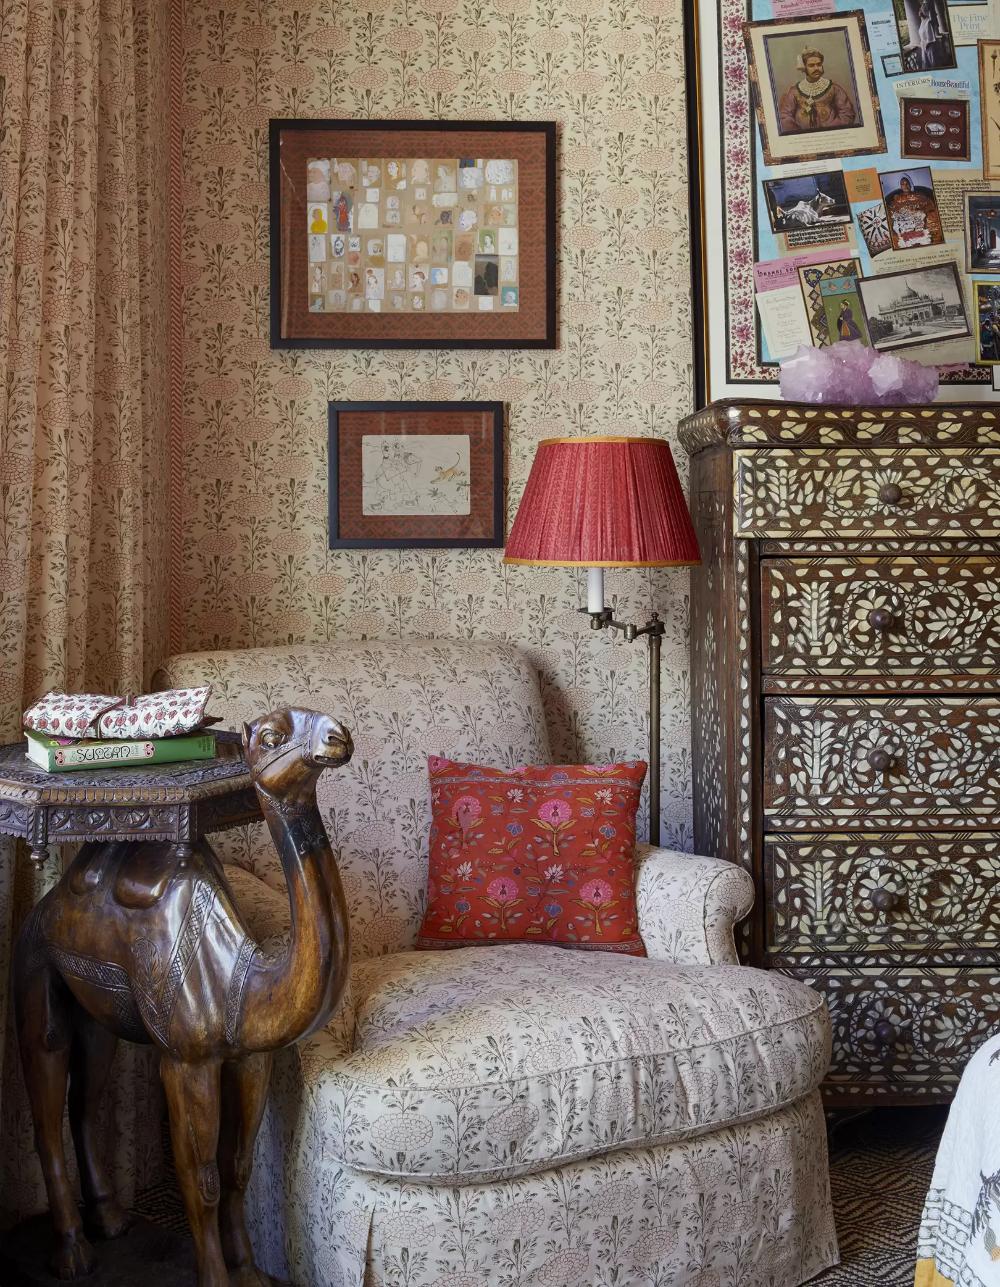 Textile designer Lisa Fine's New York apartment in 2020